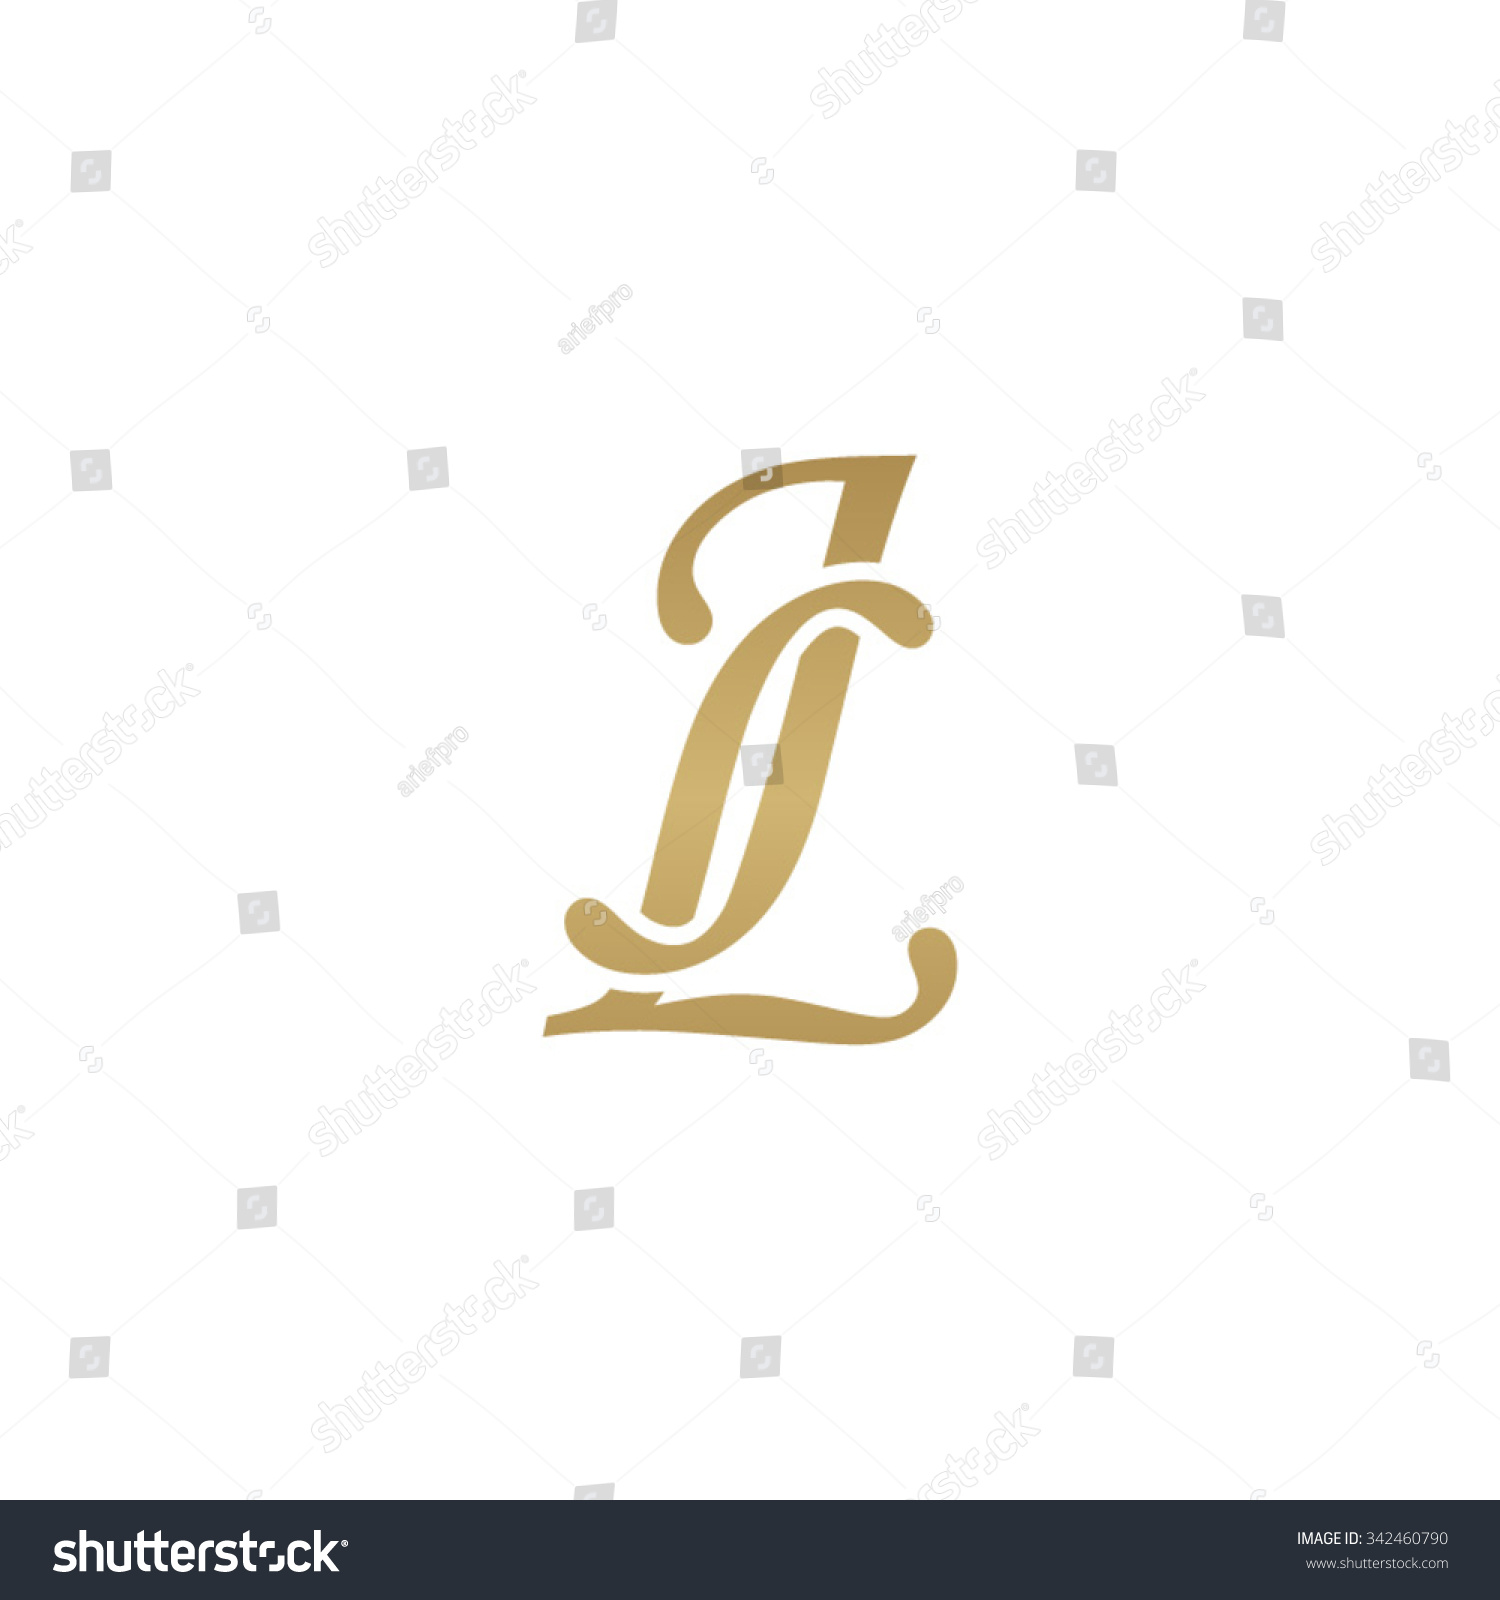 Tj initial luxury ornament monogram logo stock vector - Jl Initial Monogram Logo